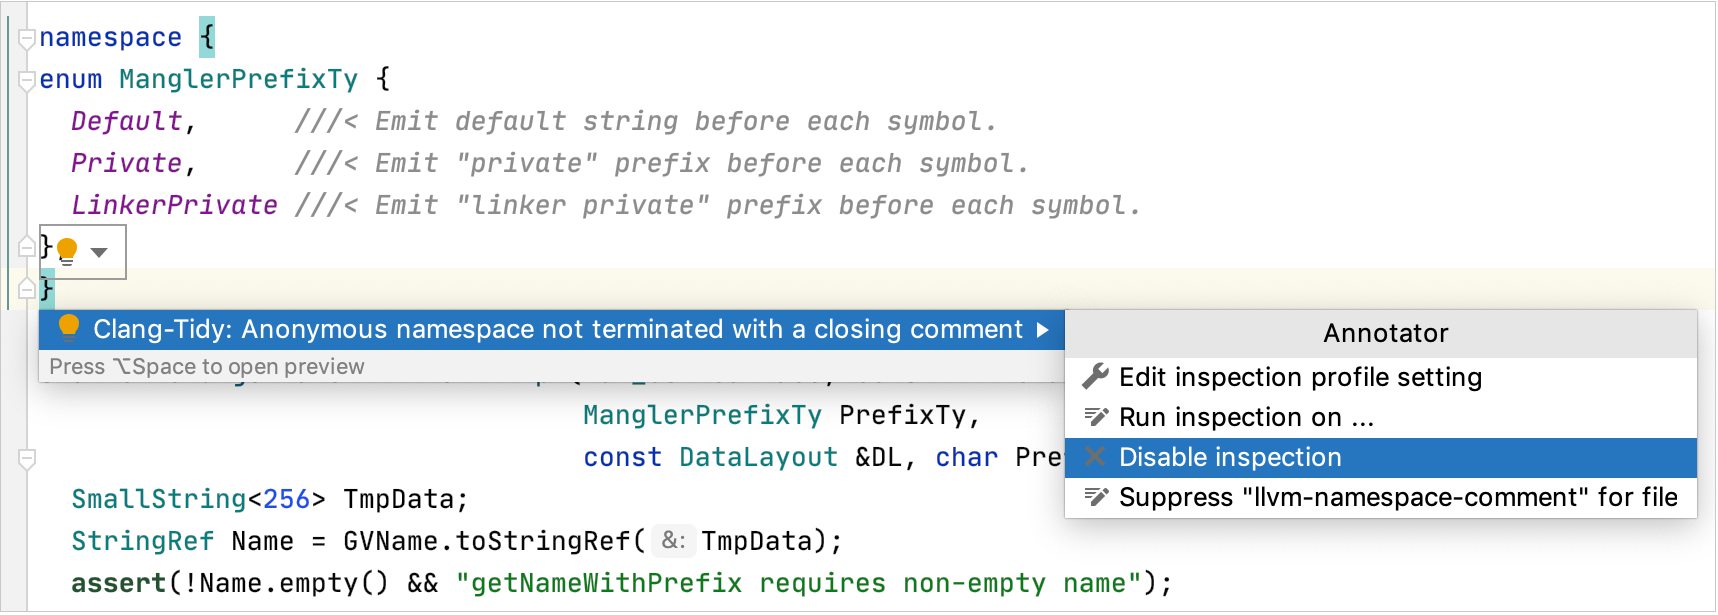 Configuring checks from the context menu